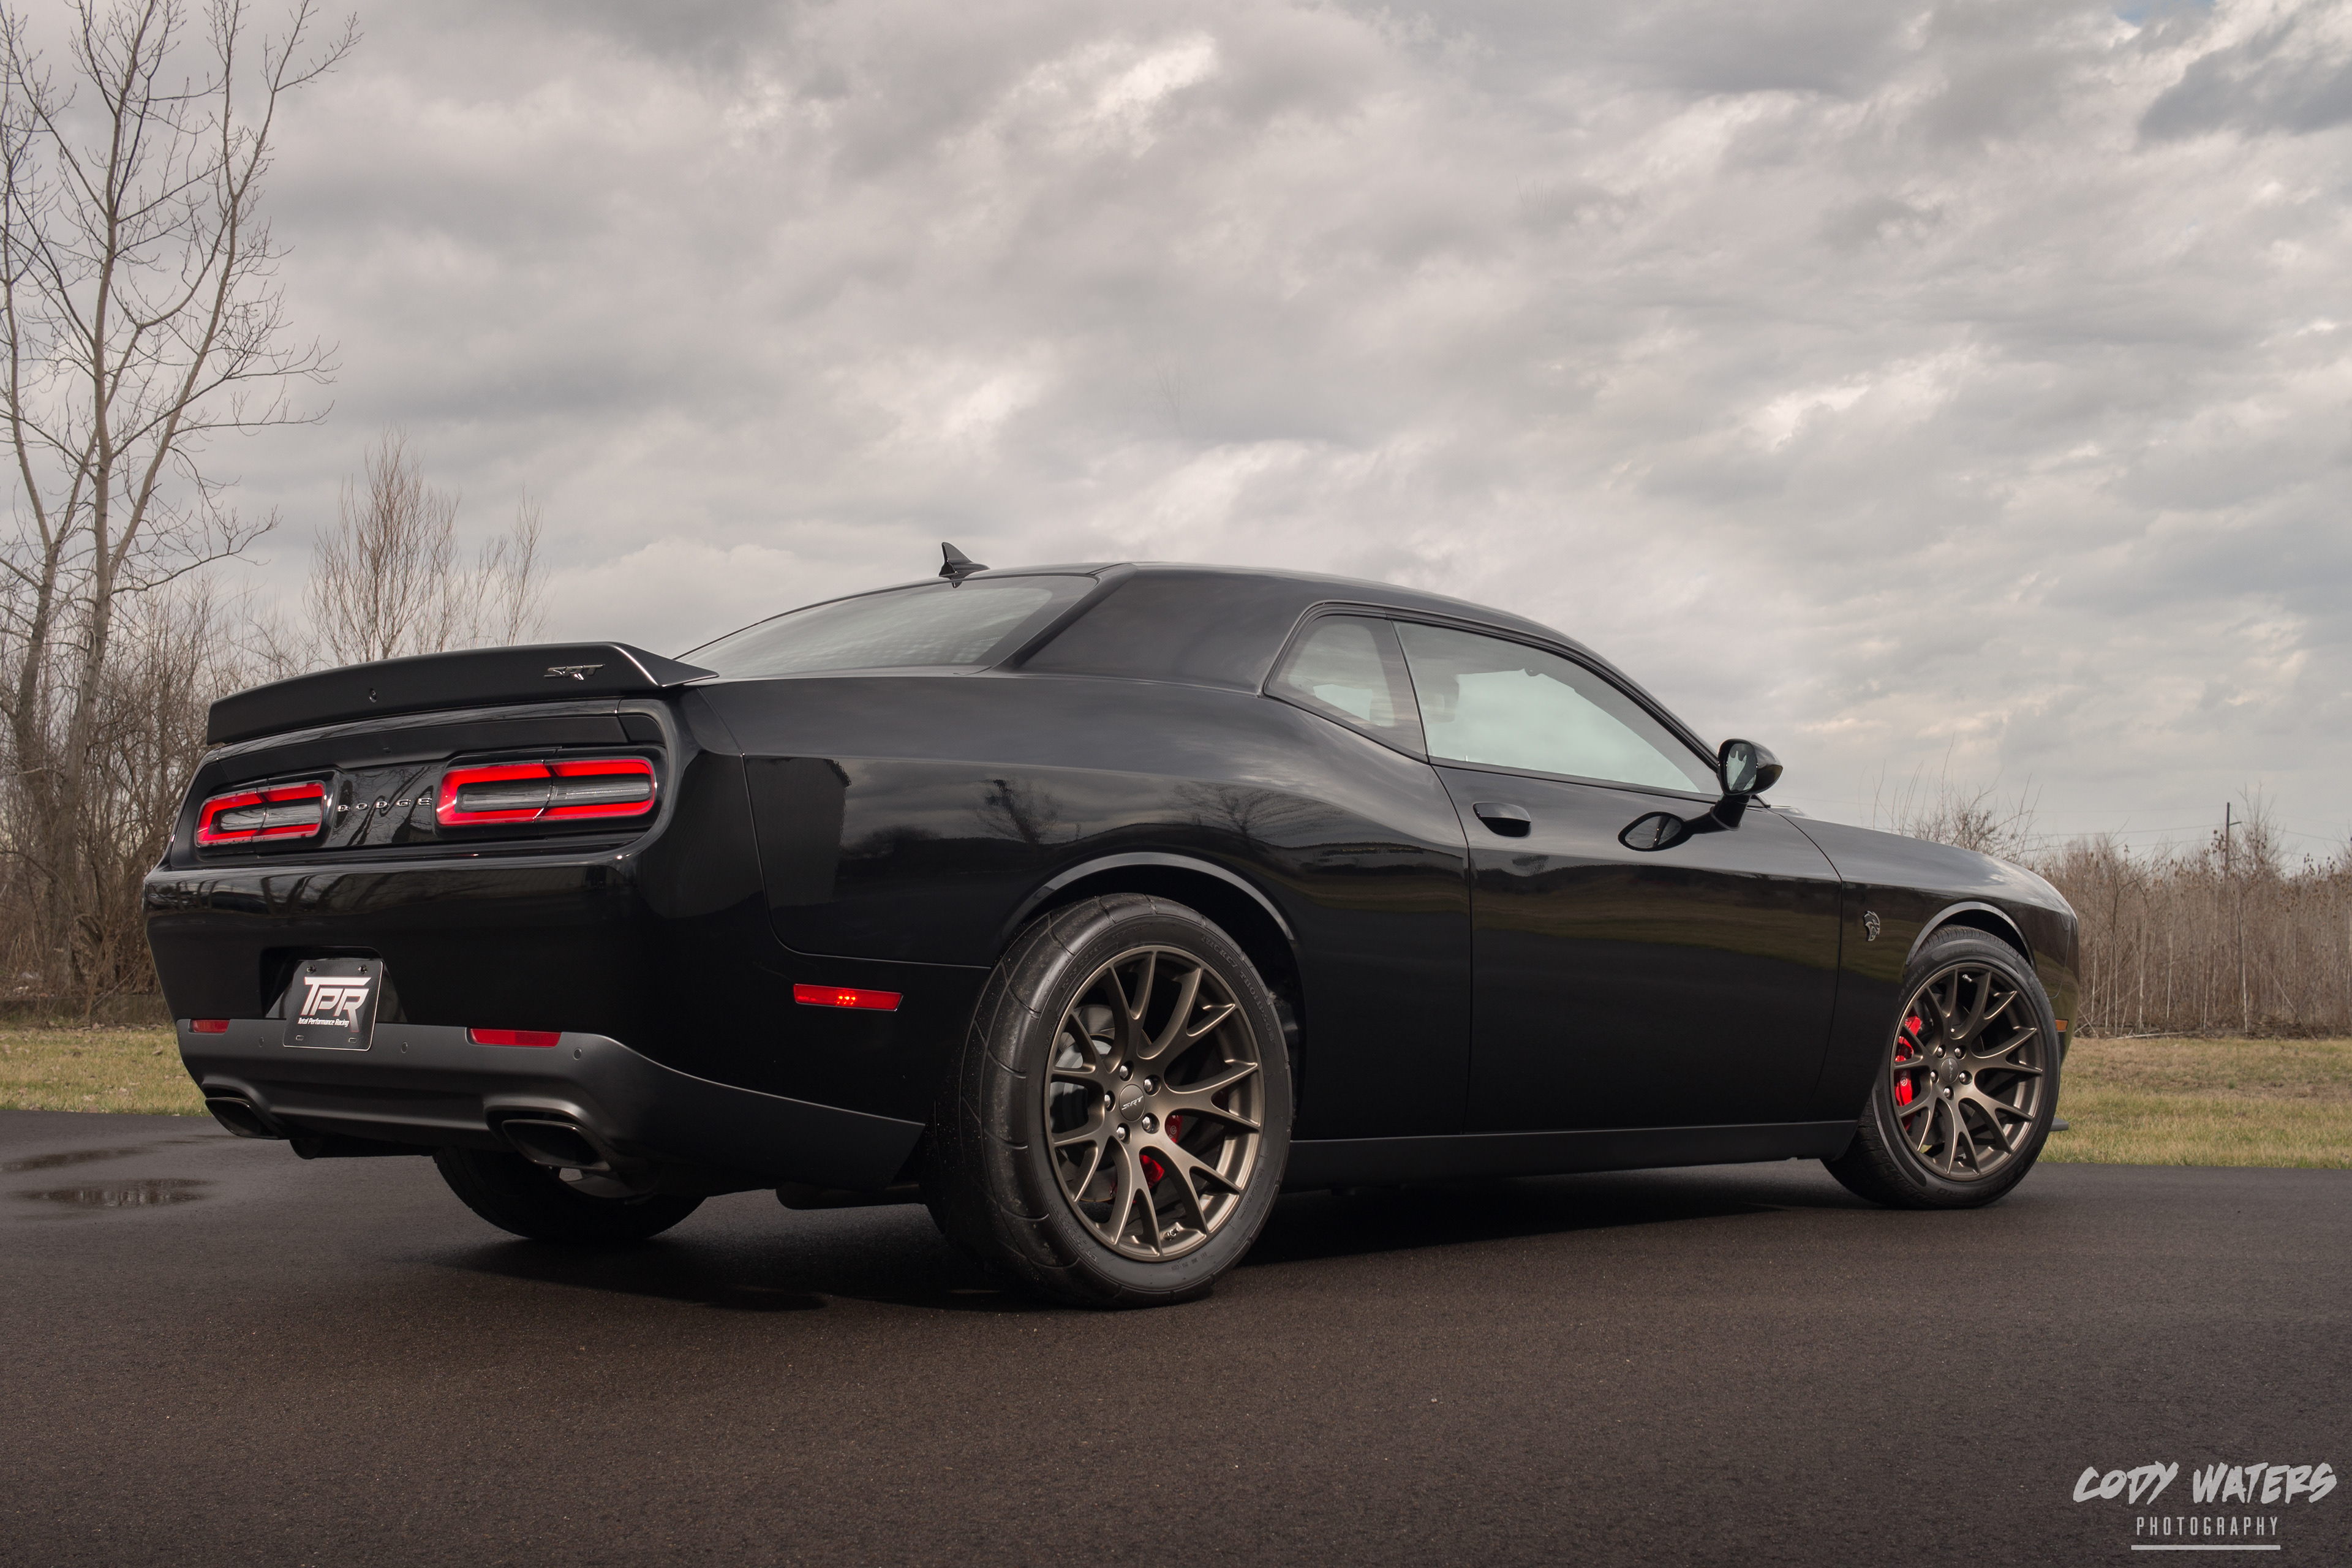 2018 Dodge Challenger >> Cody Waters | Automotive Photographer - 2016 Dodge Challenger Hellcat